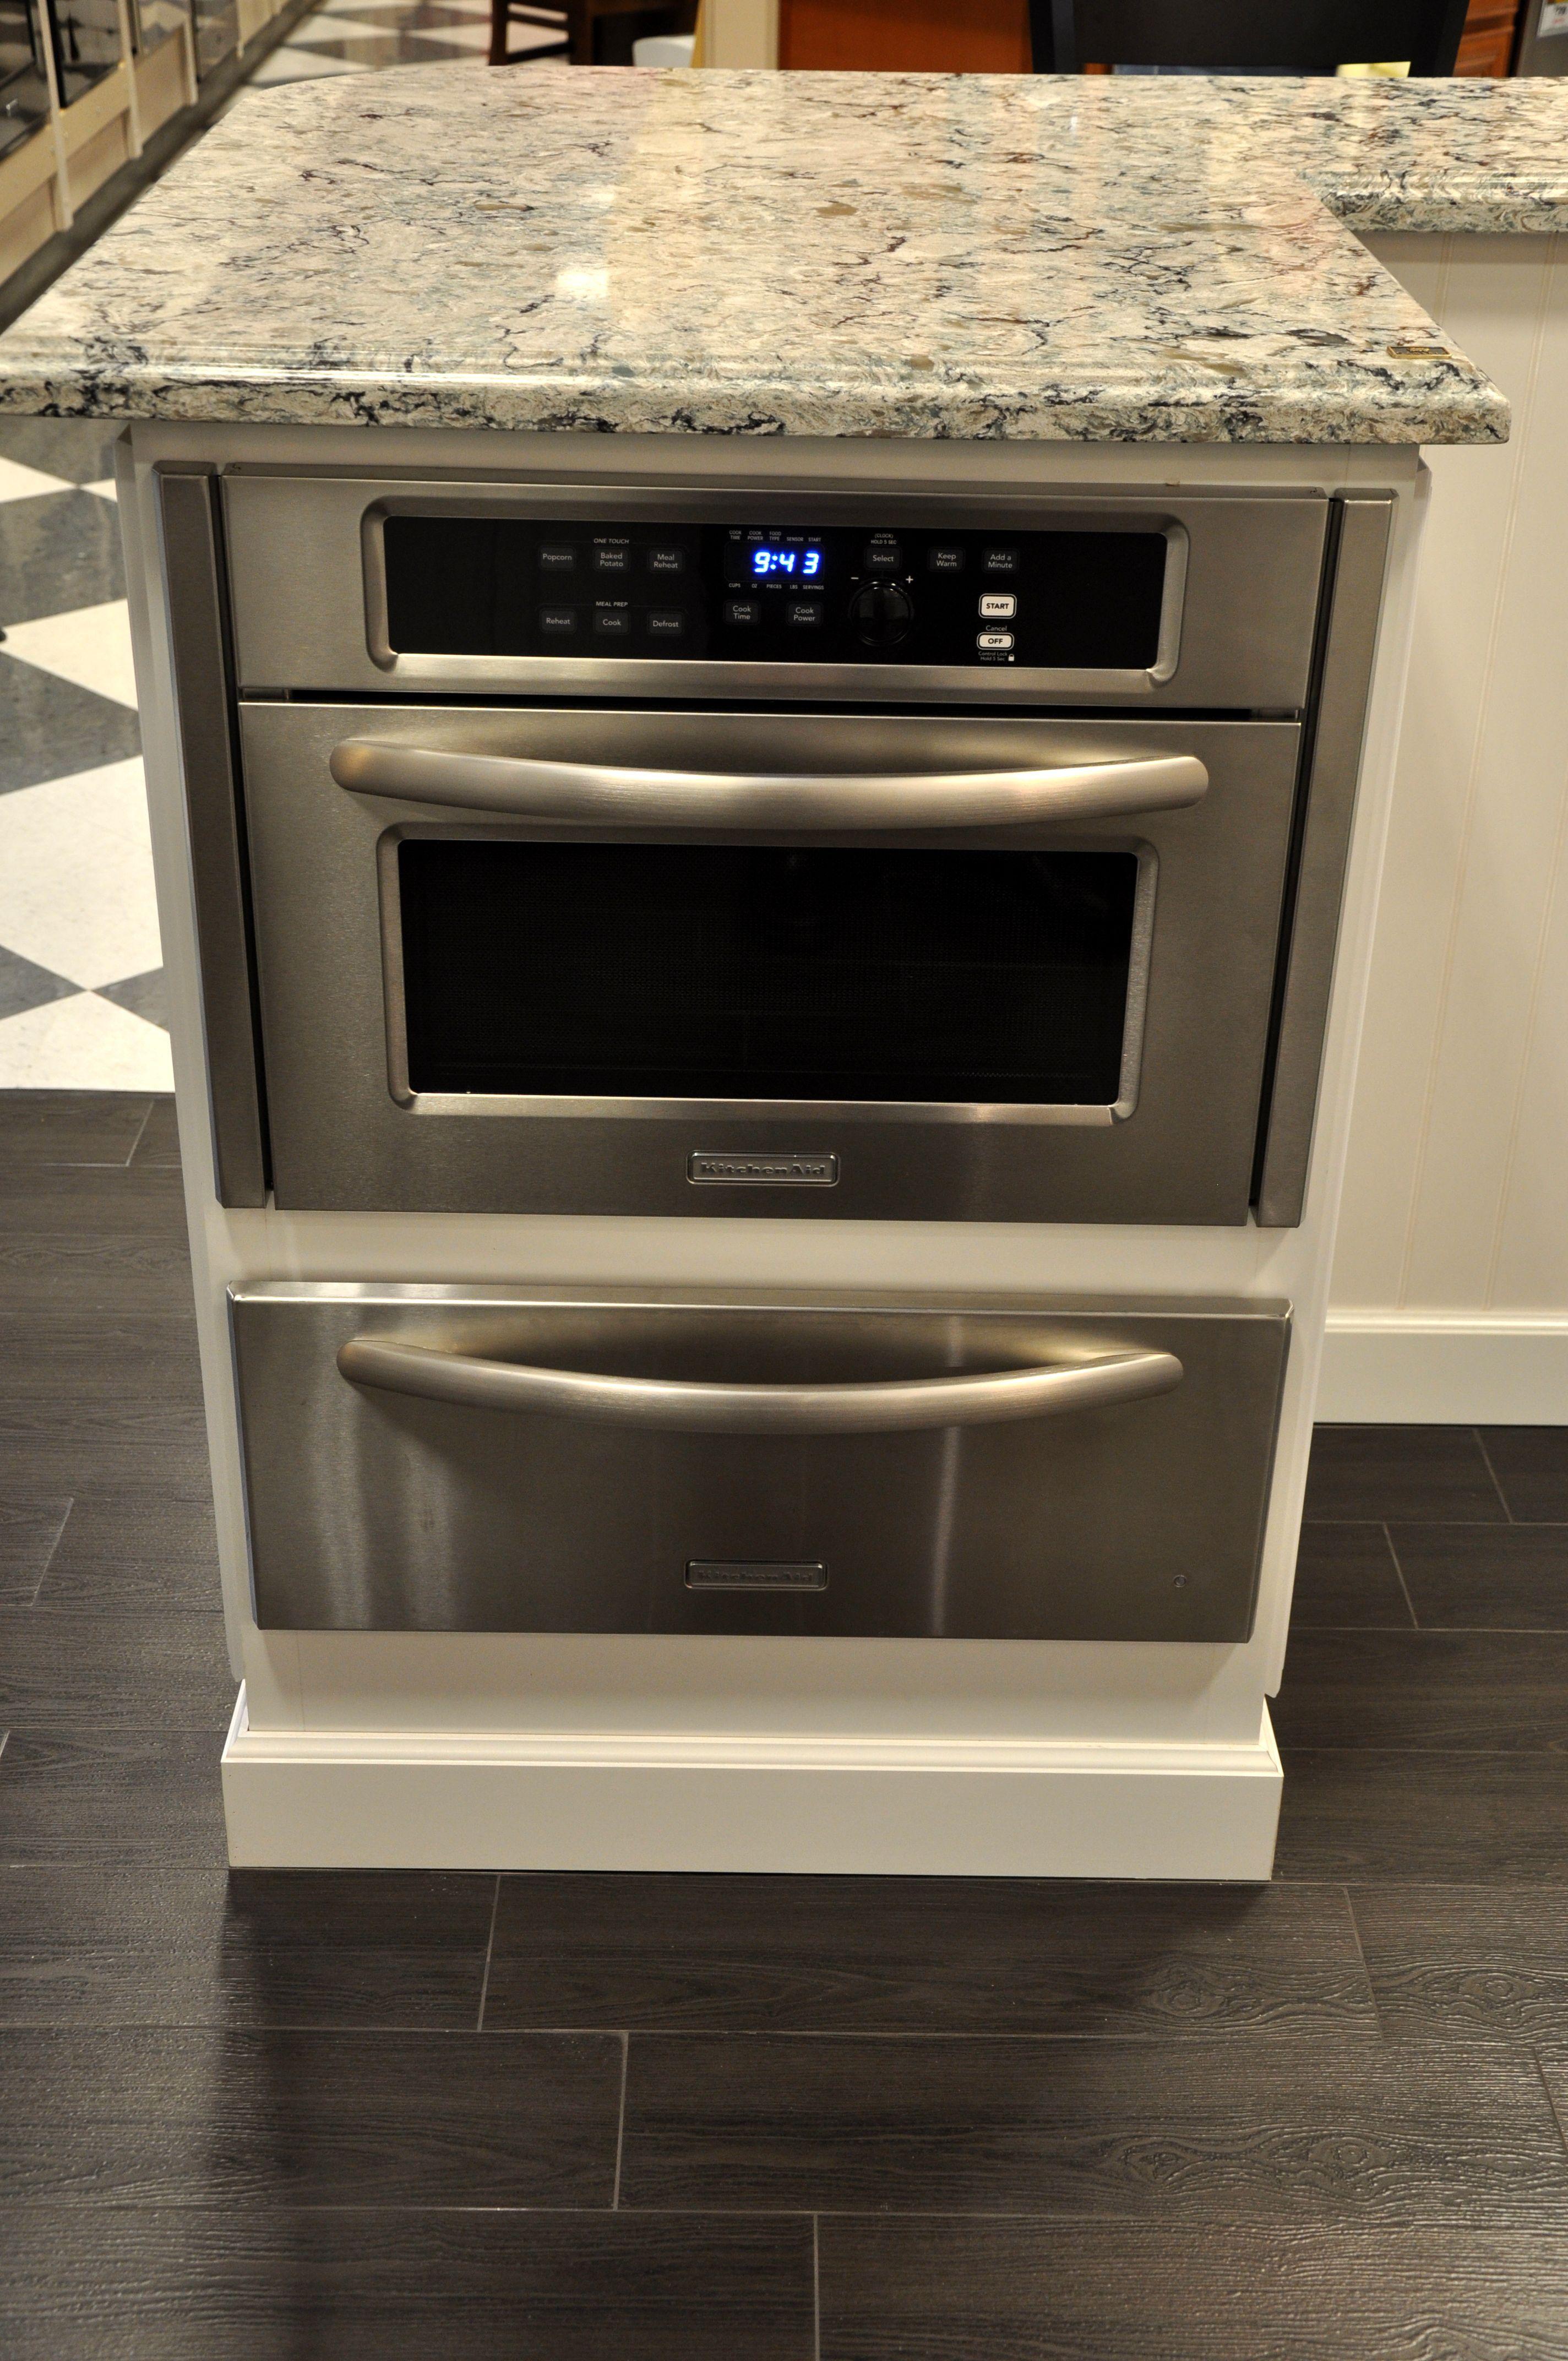 Attrayant KitchenAid Mircowave With Slow Cook Warming Drawer Below.